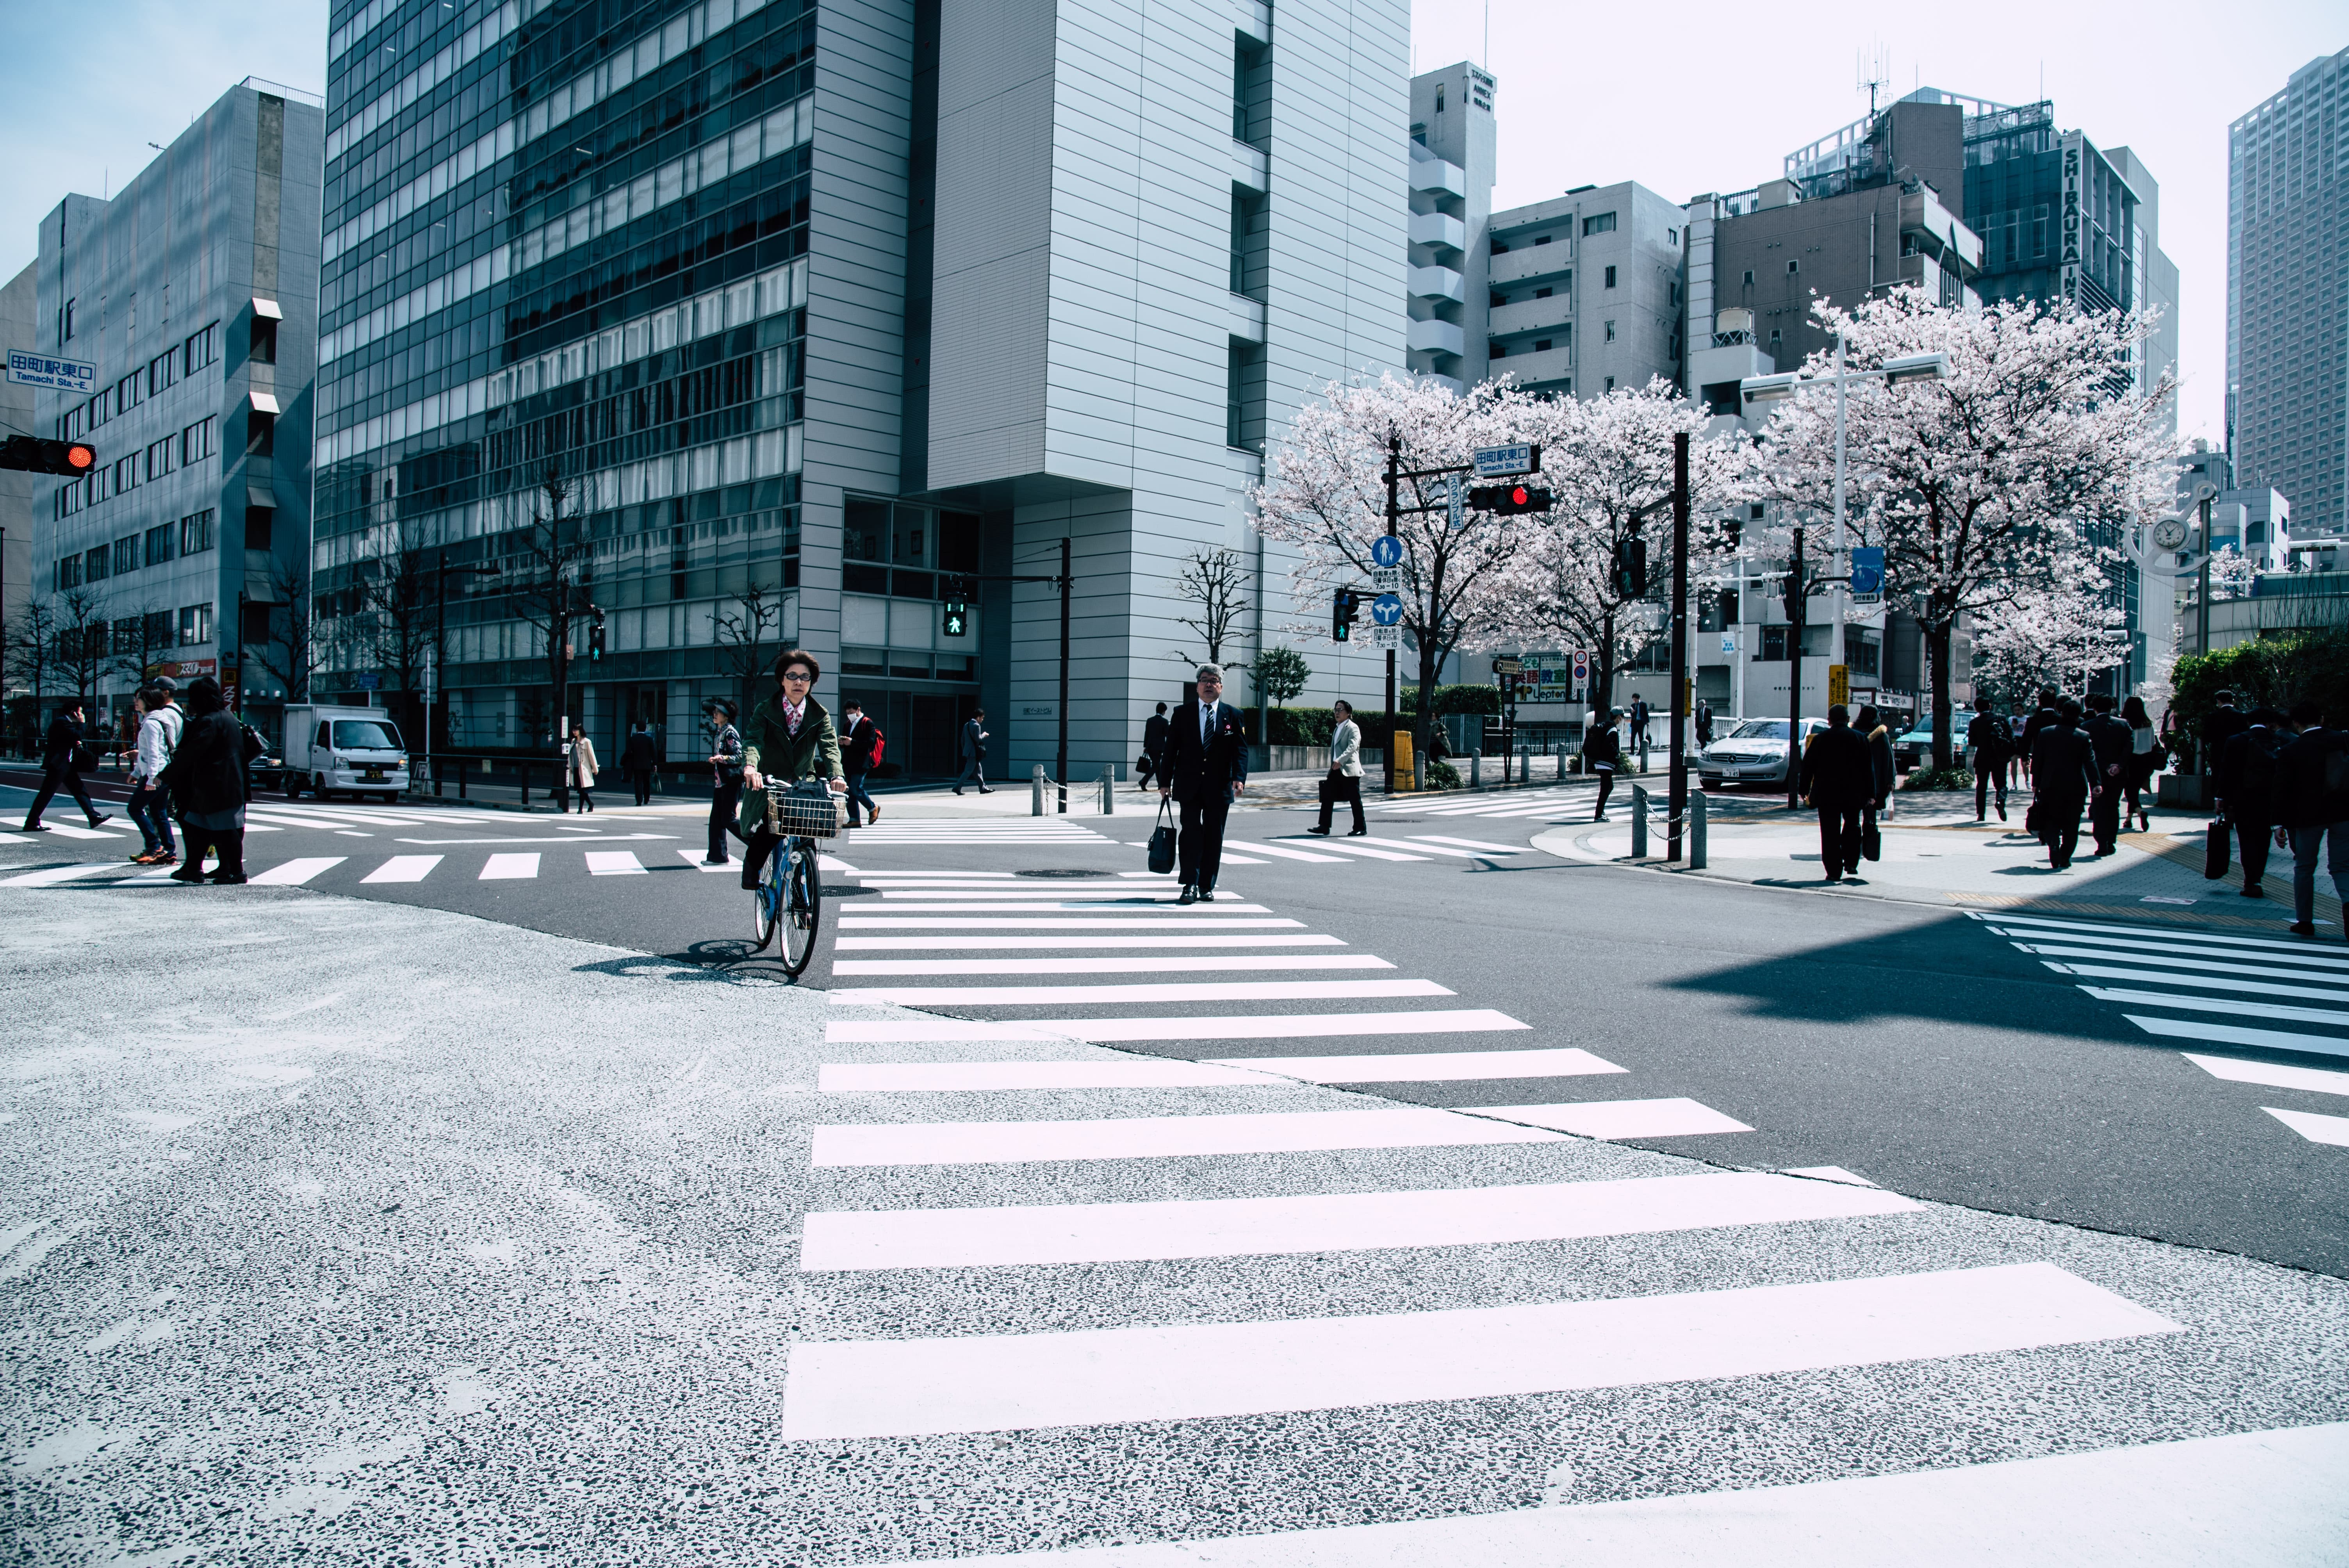 Pedestrians walking across a cross walk